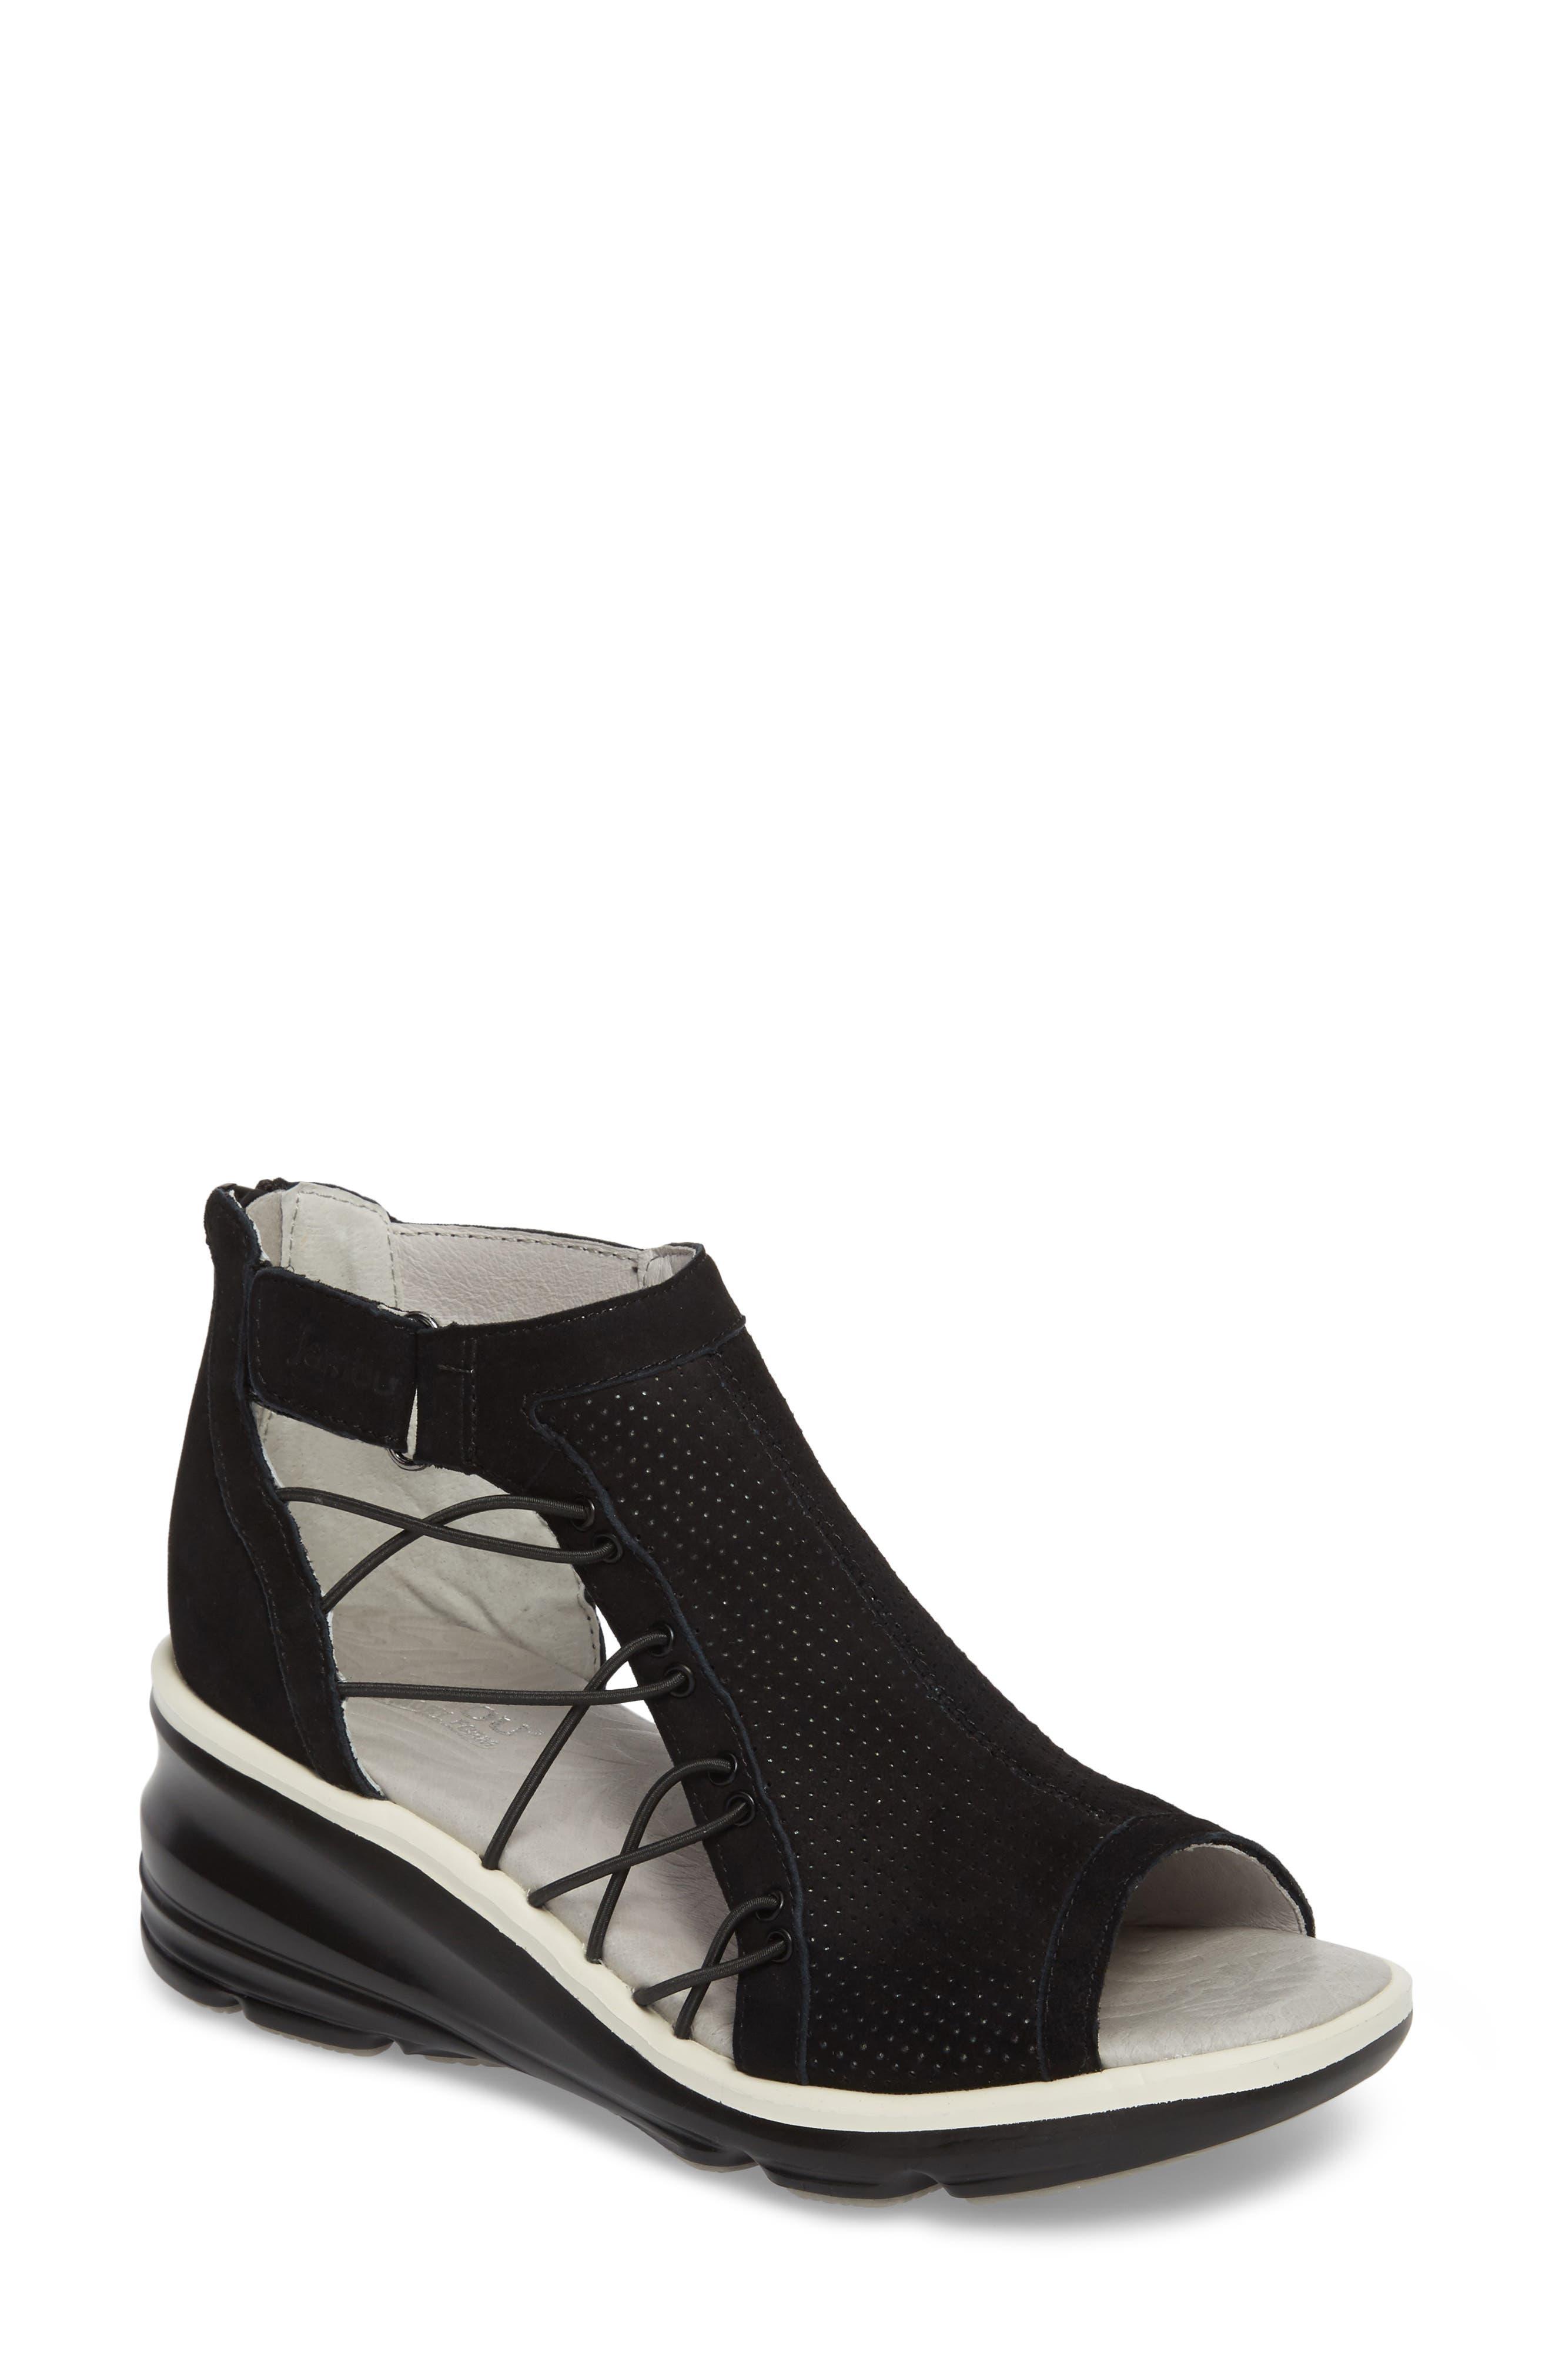 Main Image - Jambu Naomi Perforated Wedge Sandal (Women)